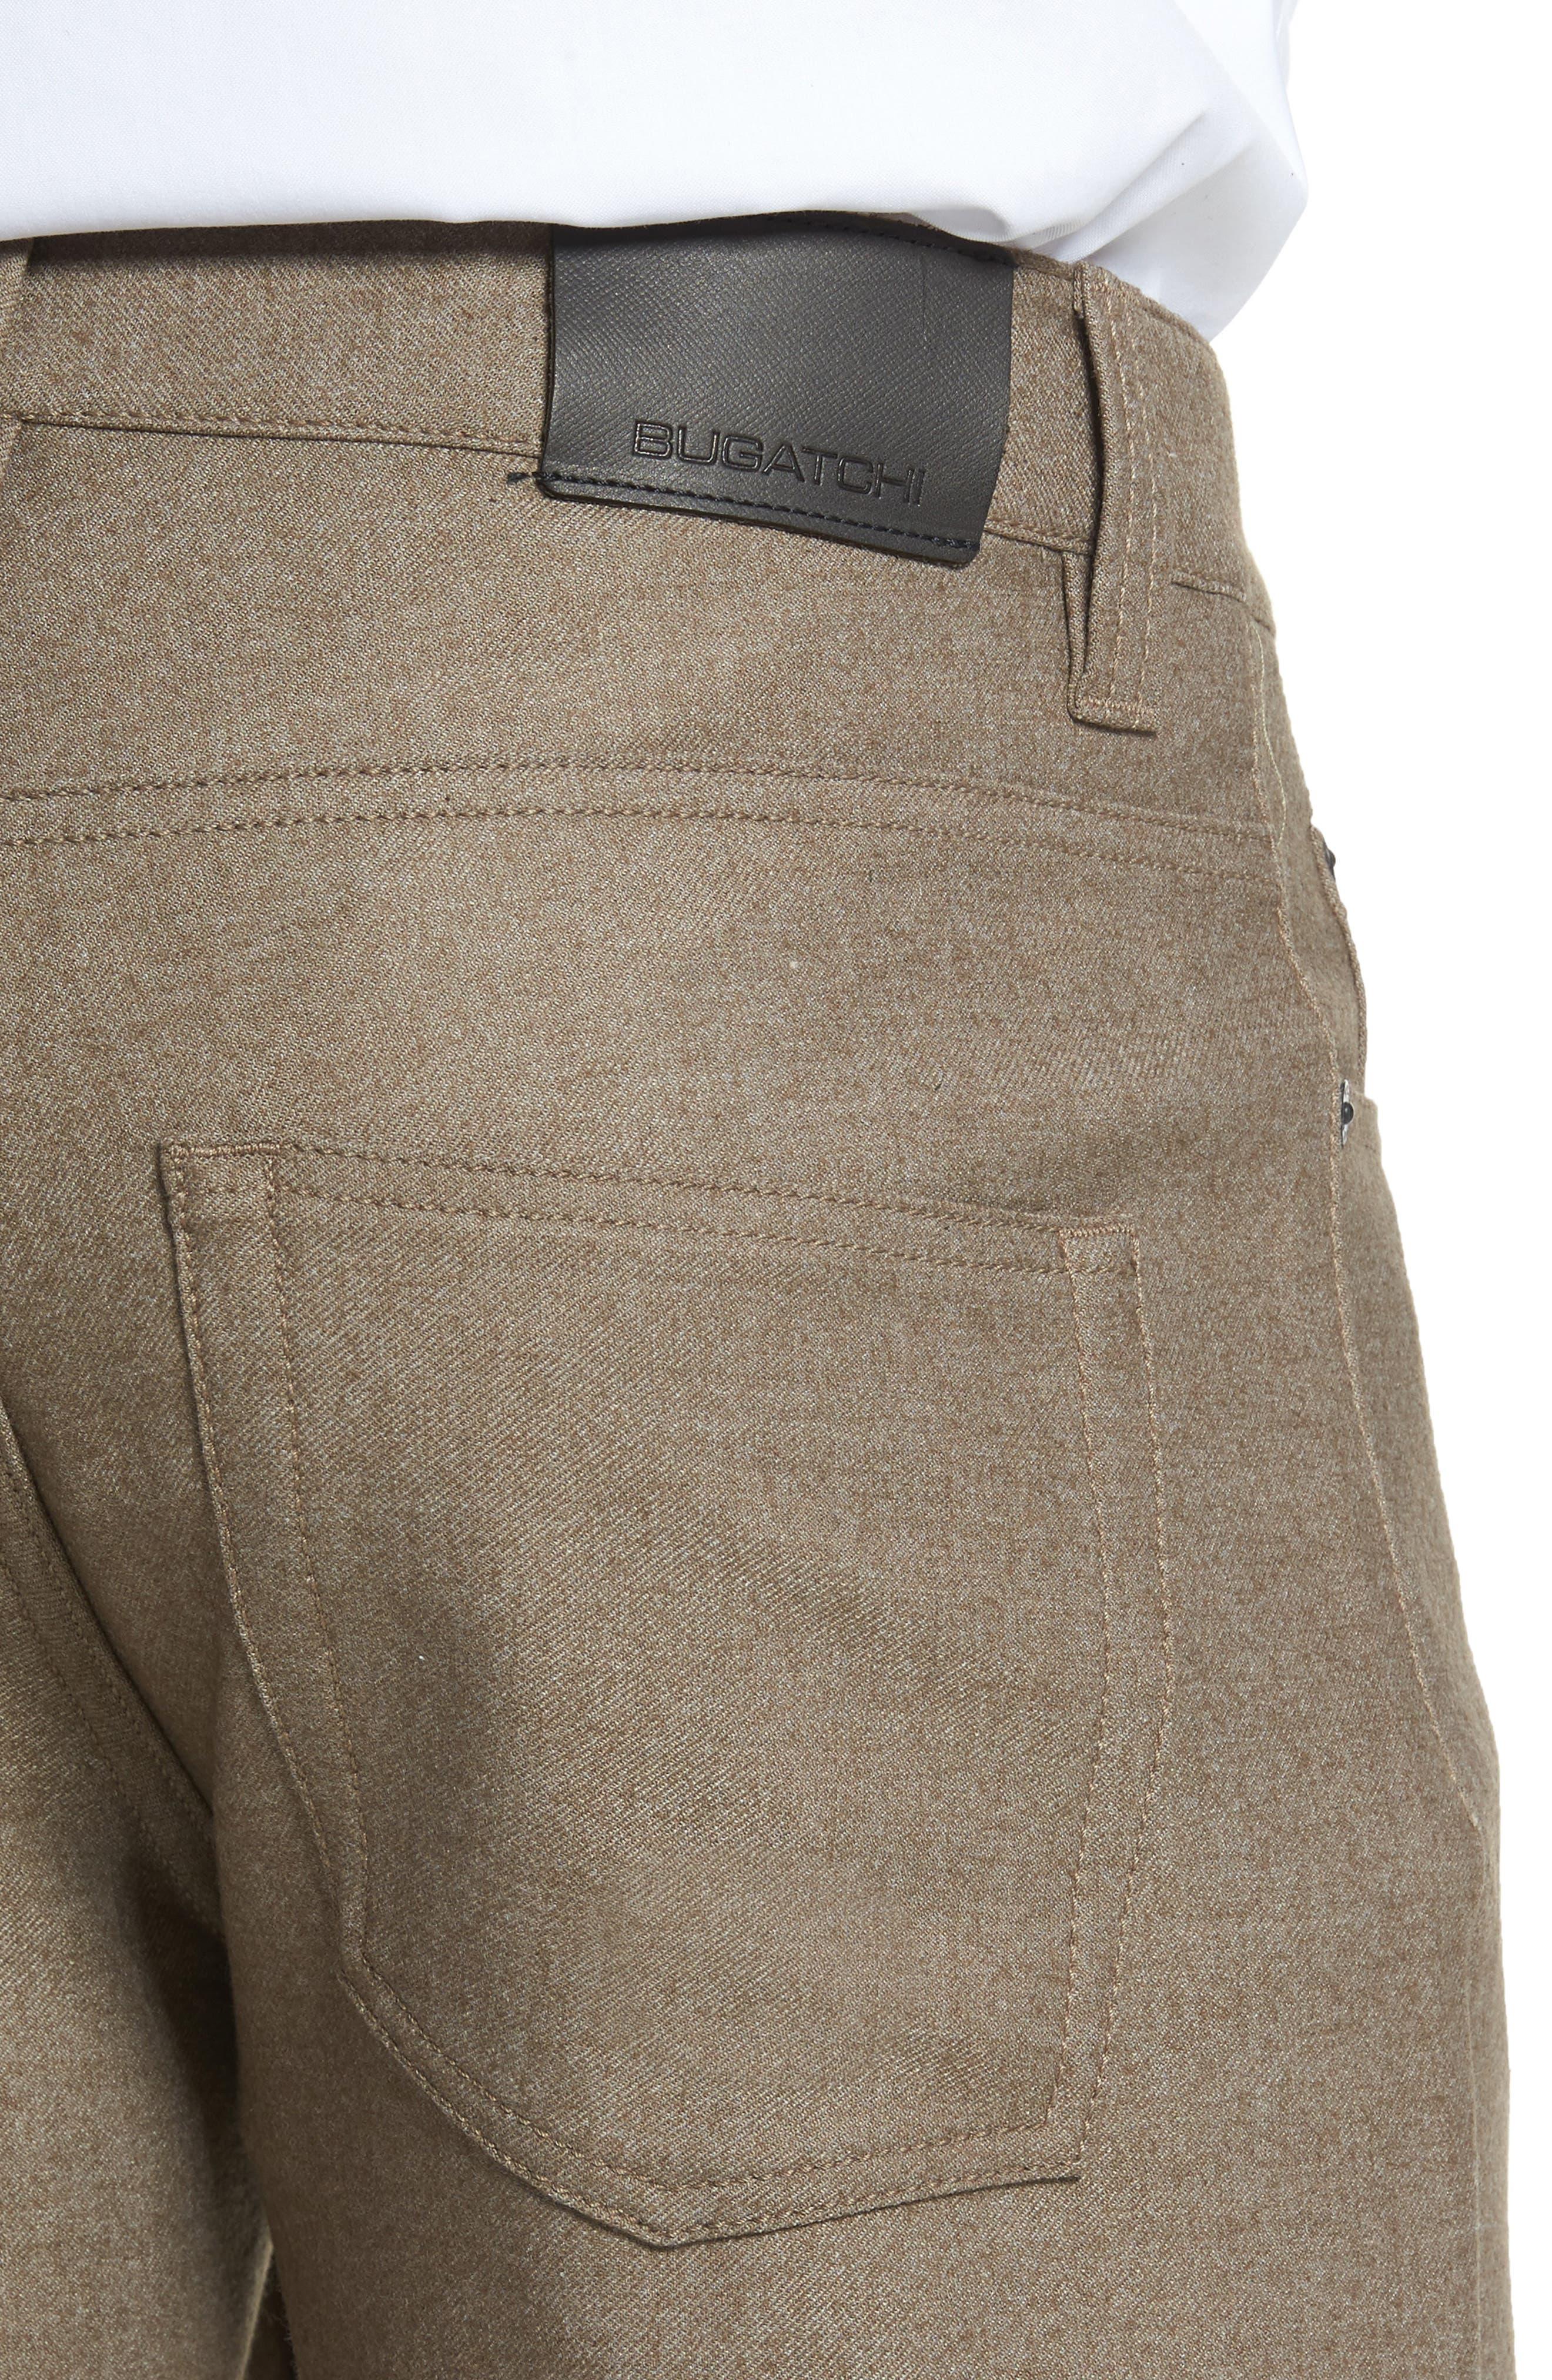 Wool Blend Pants,                             Alternate thumbnail 4, color,                             208